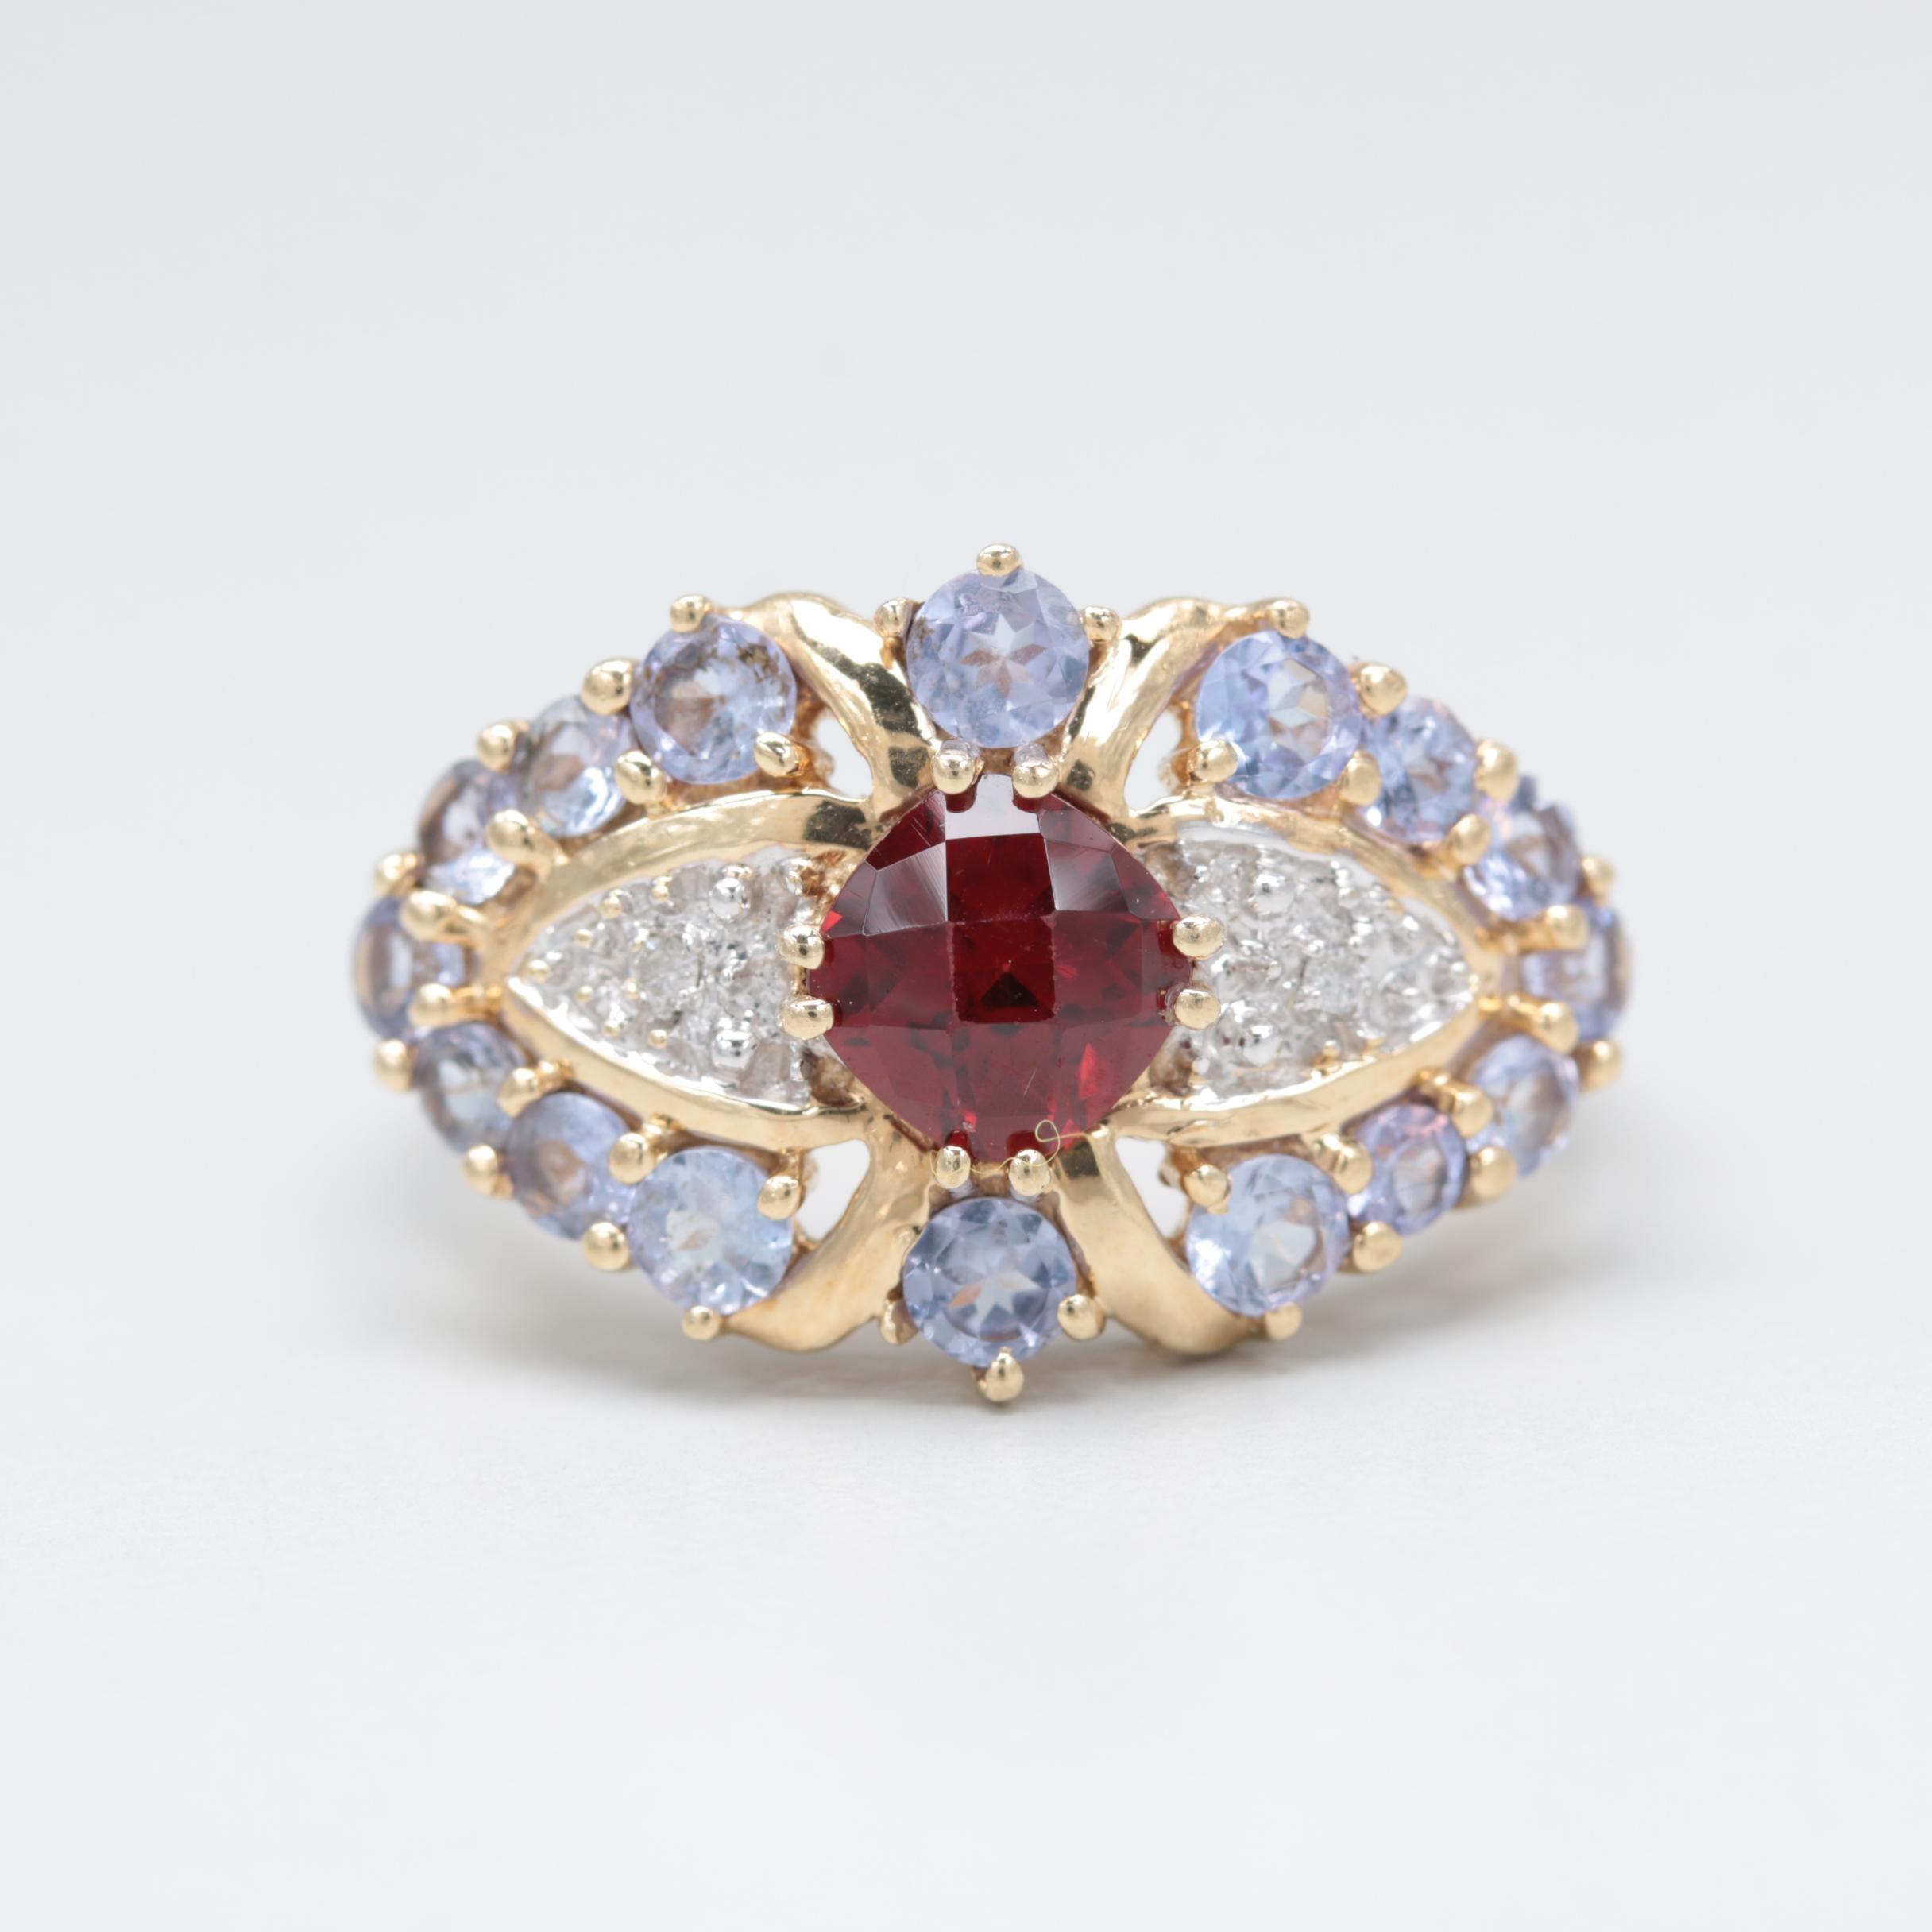 10K Yellow Gold Garnet, Diamond and Tanzanite Ring